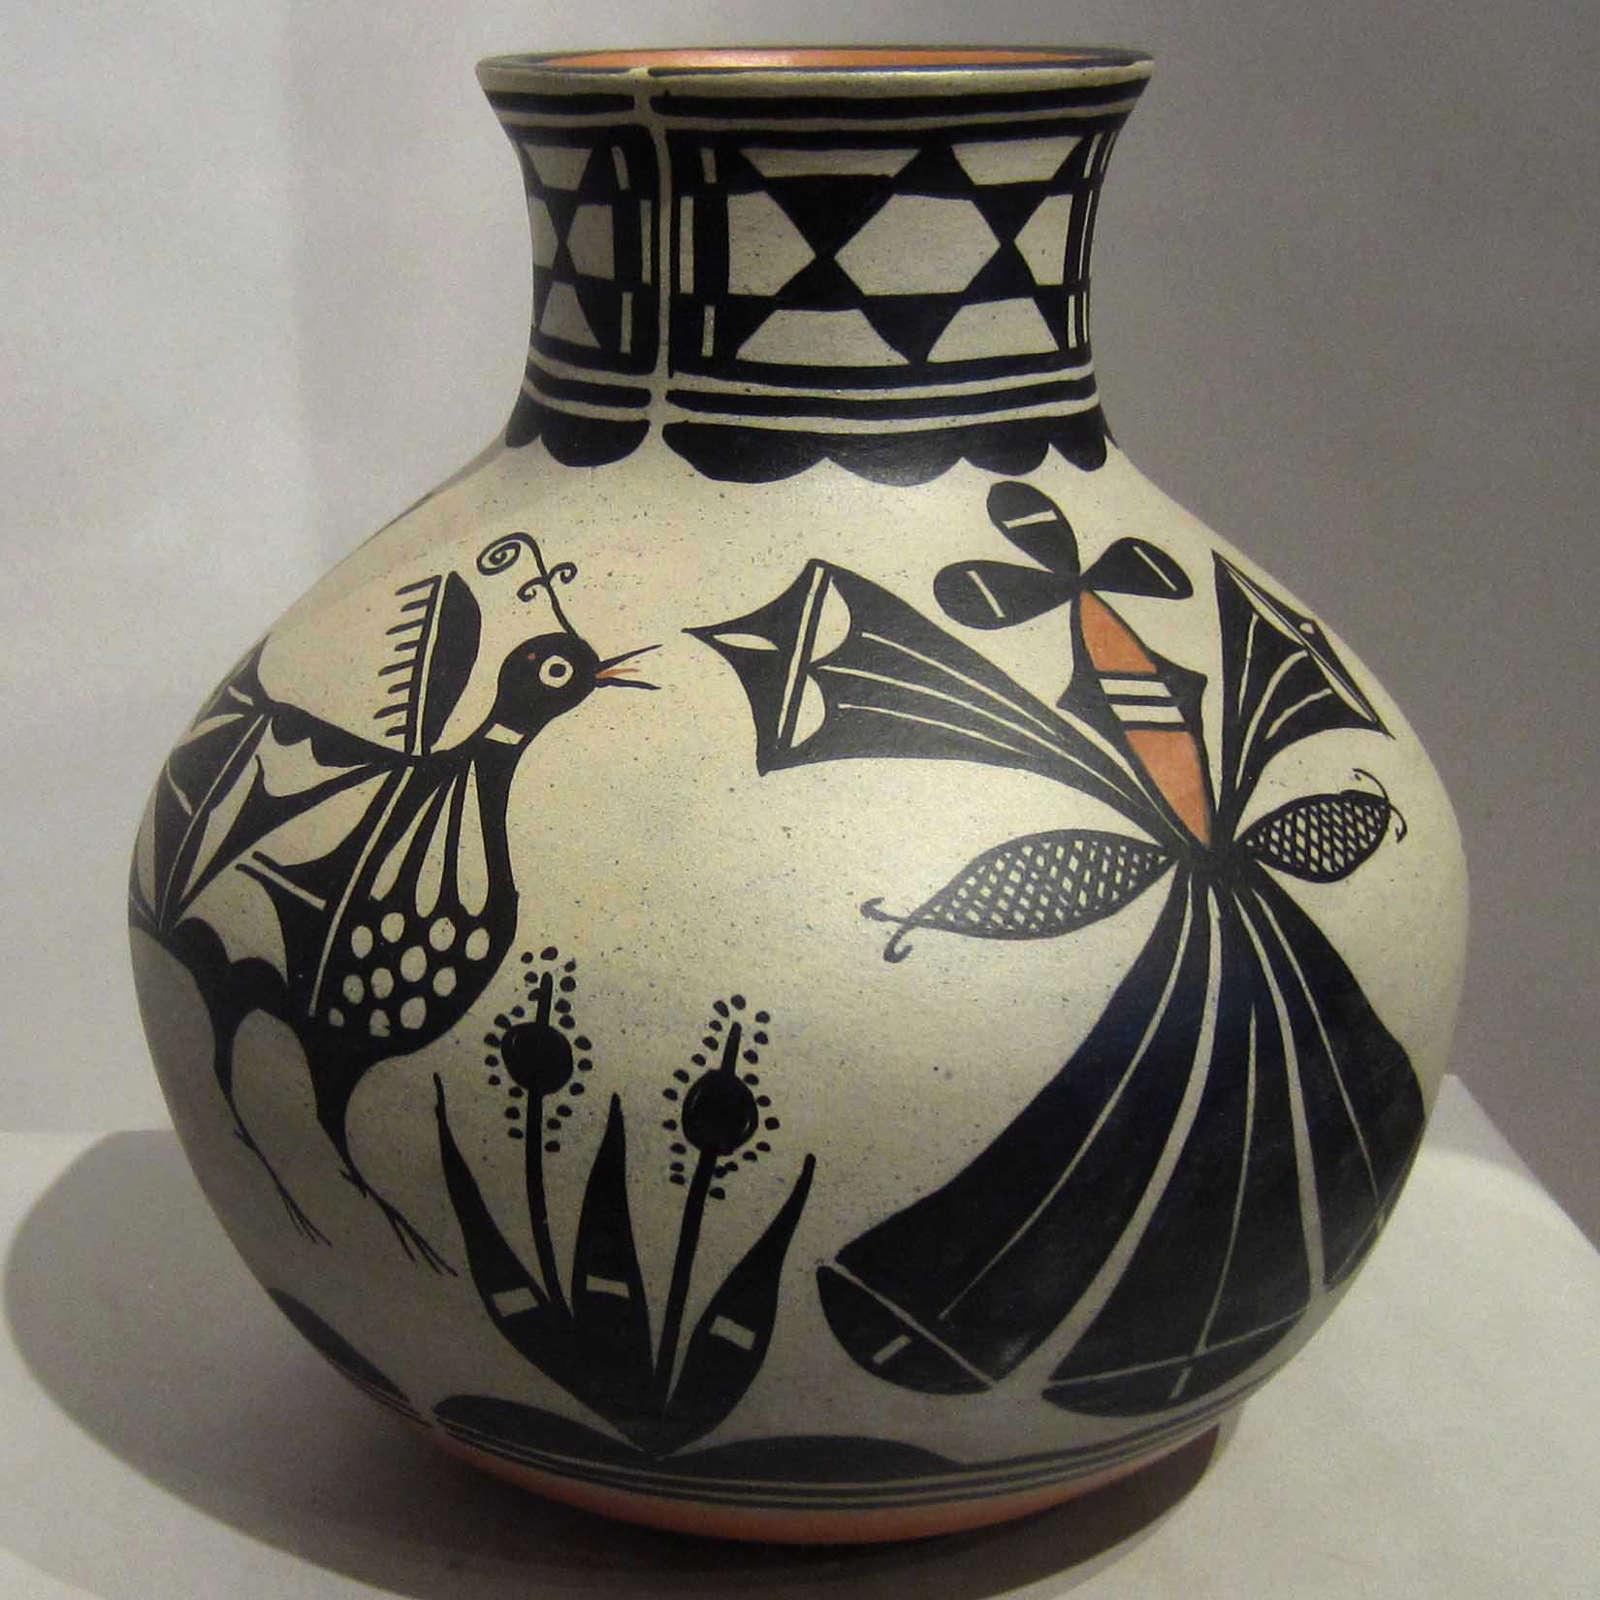 644 best one million ideas for mason jars images on ...